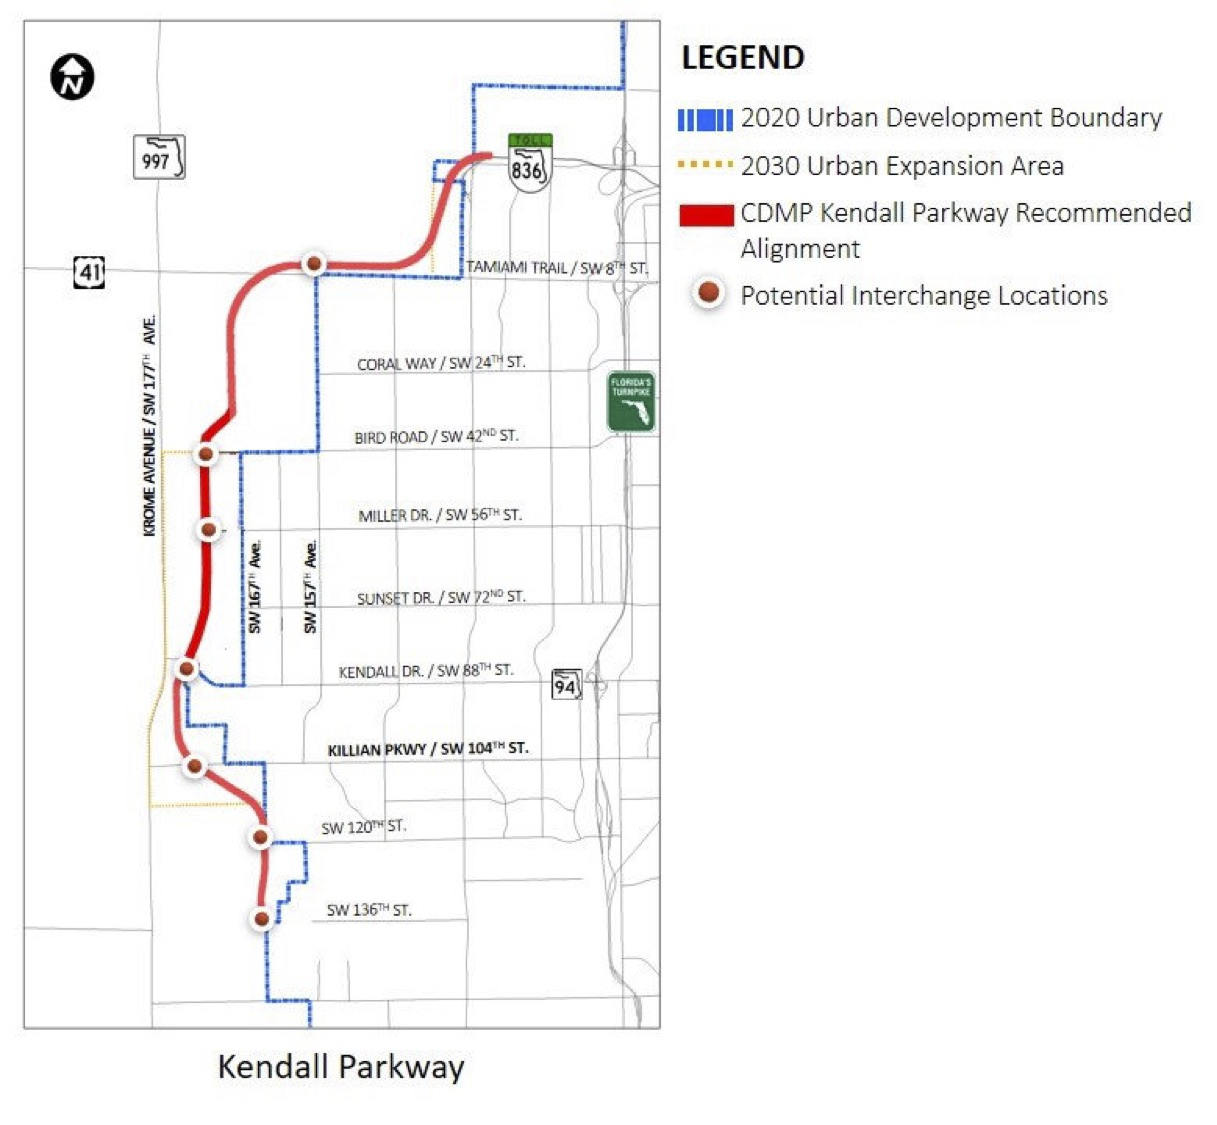 Miami-Dade approves Dolphin Expressway extension through the Everglades